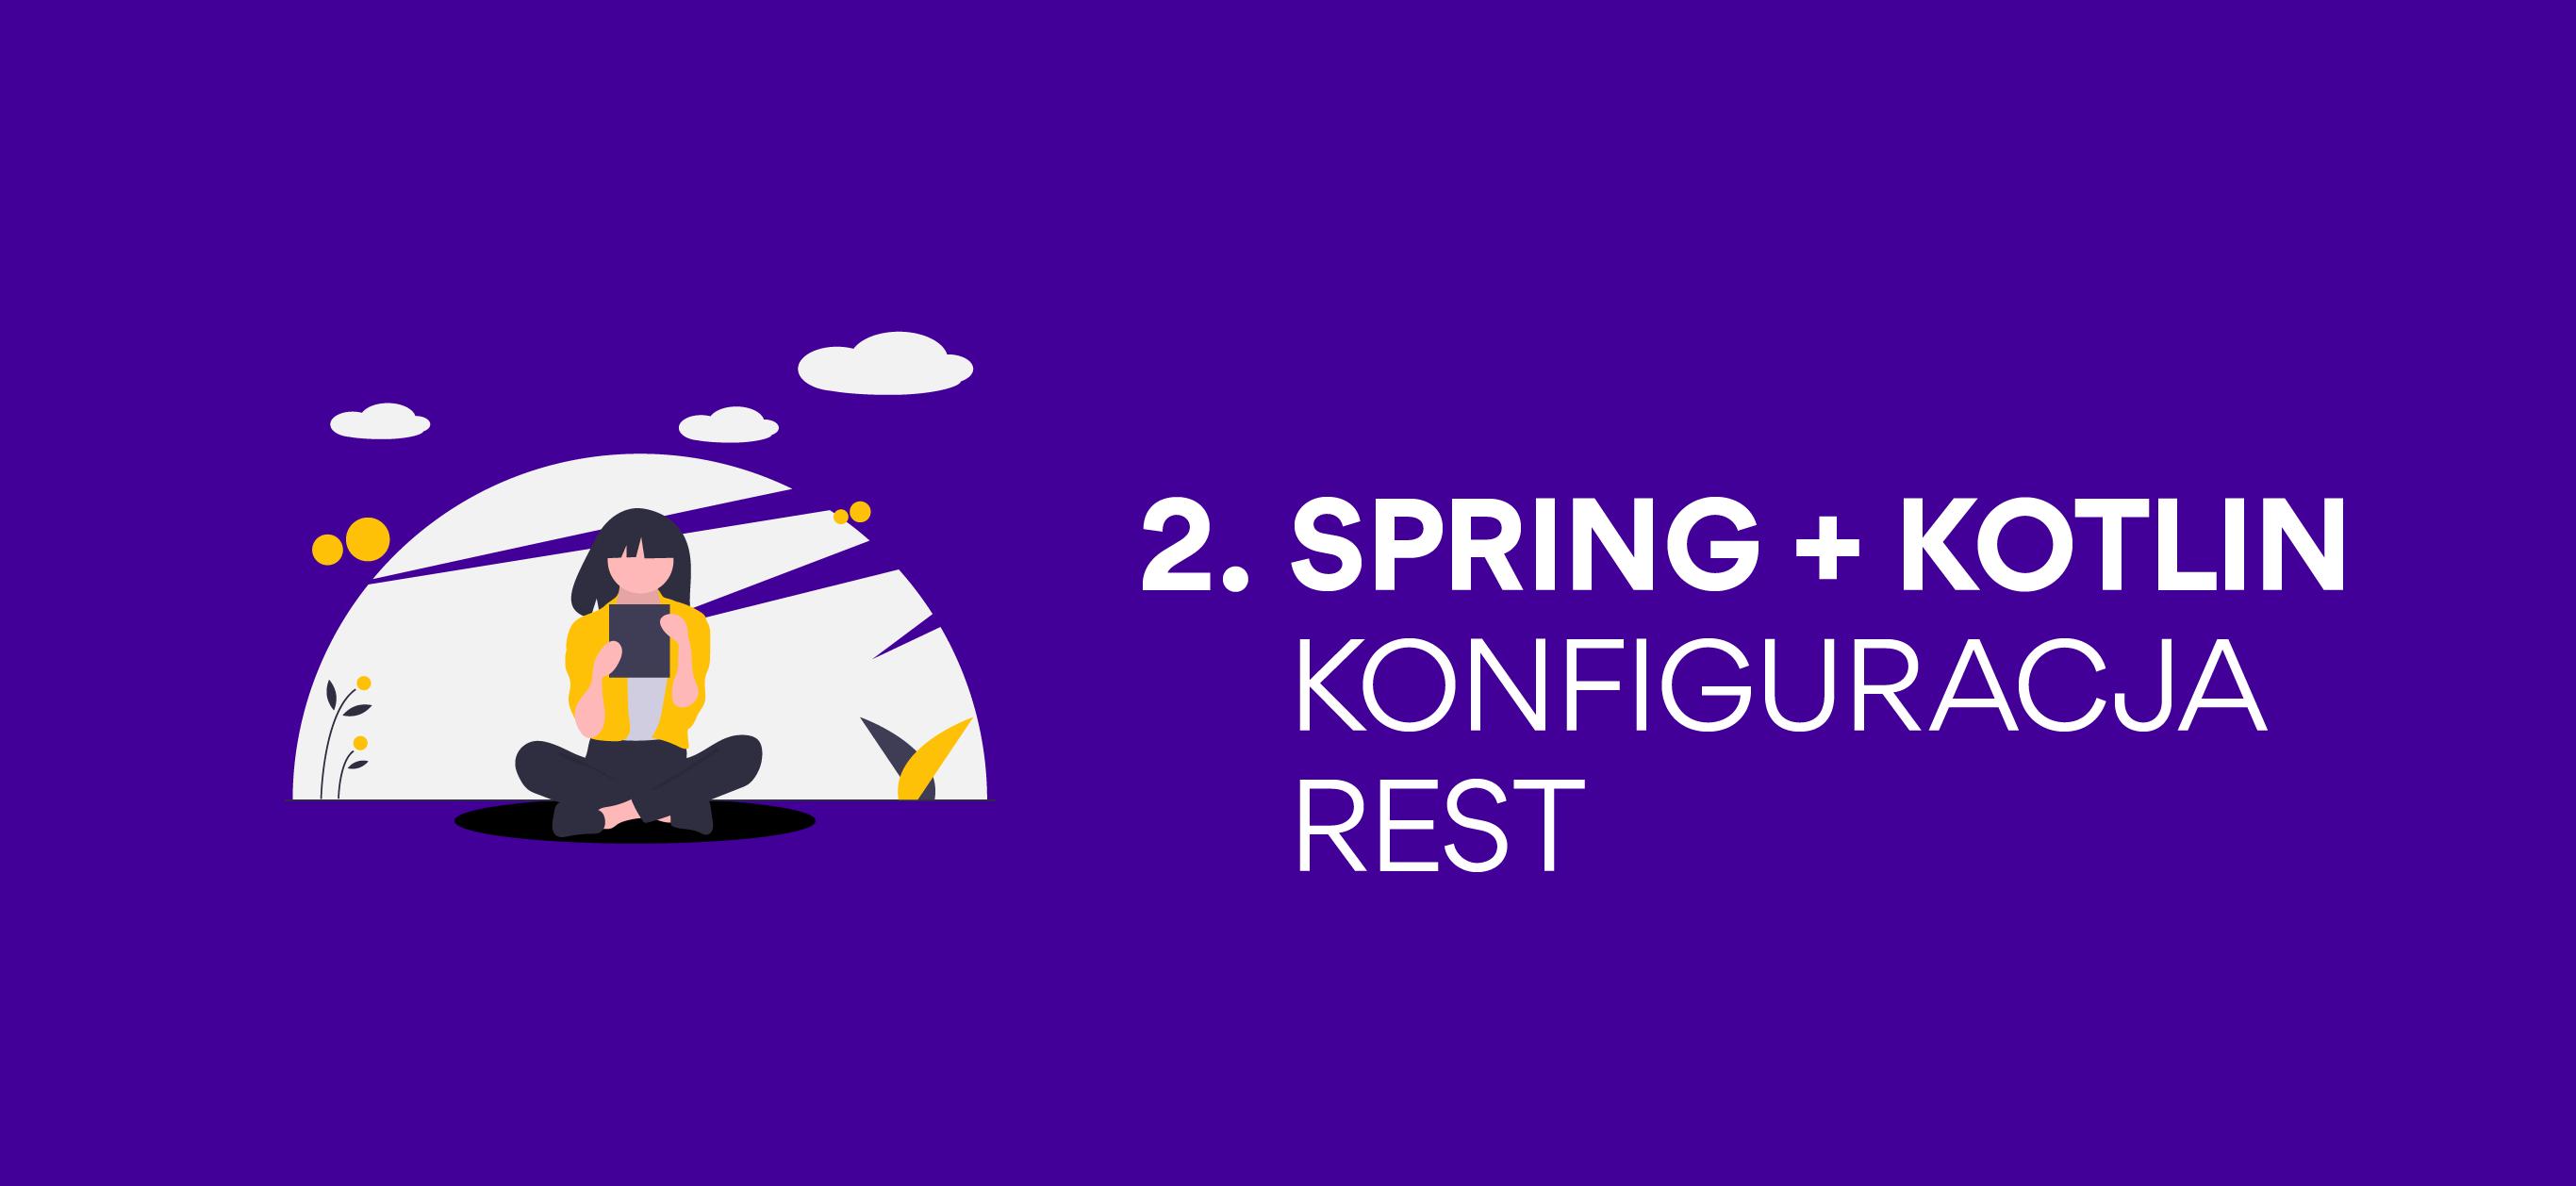 Spring + Kotlin 2 : konfiguracja REST